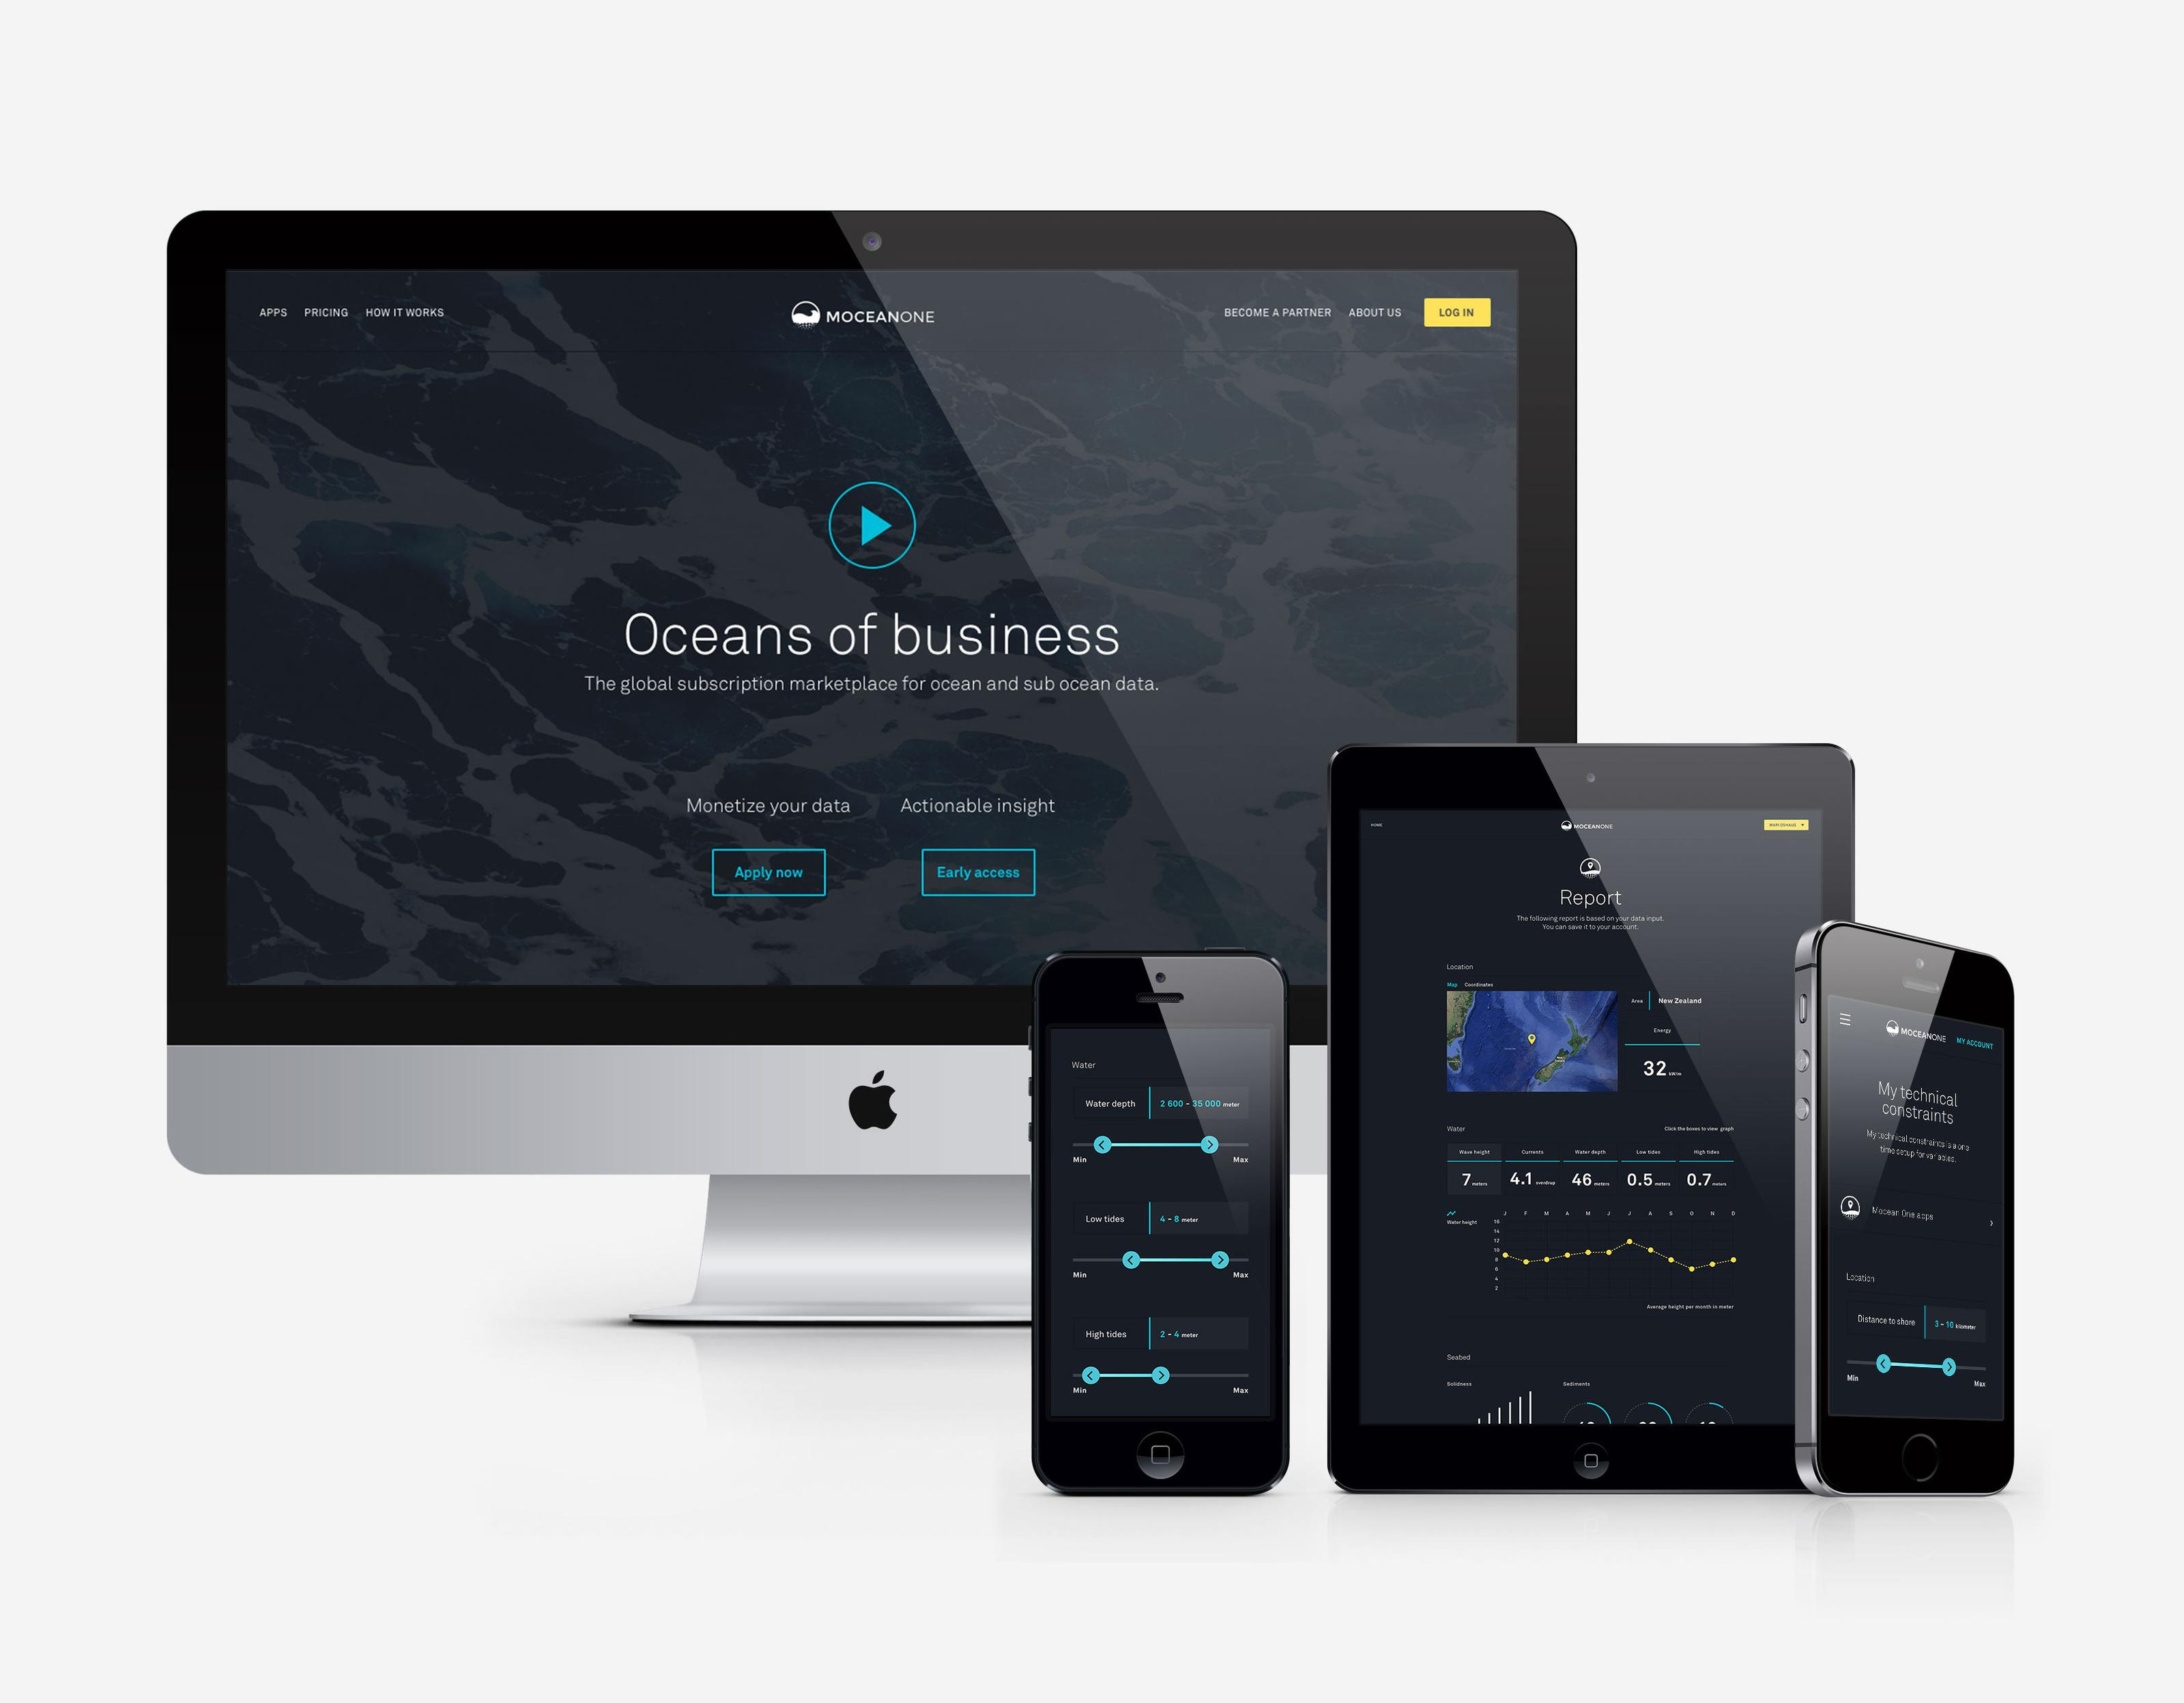 Mocean One Screenshot